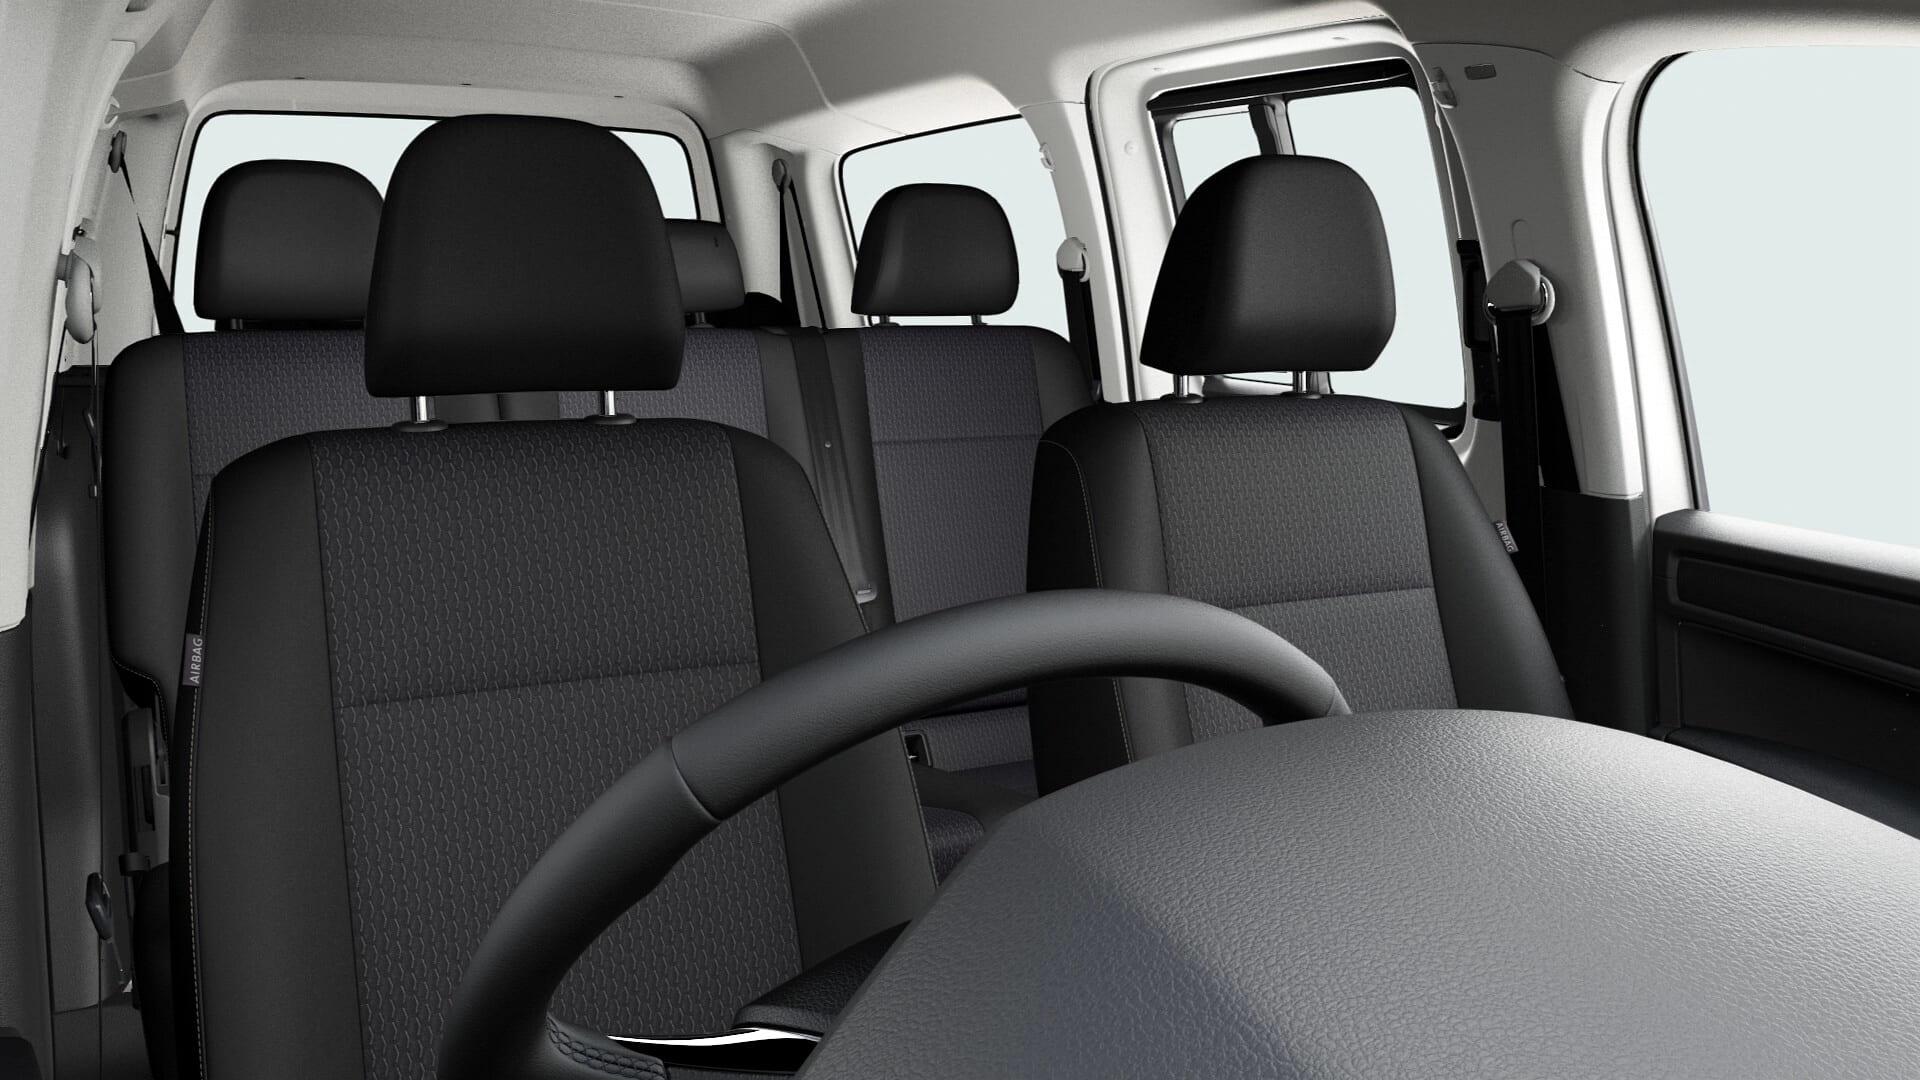 interior-all-seats